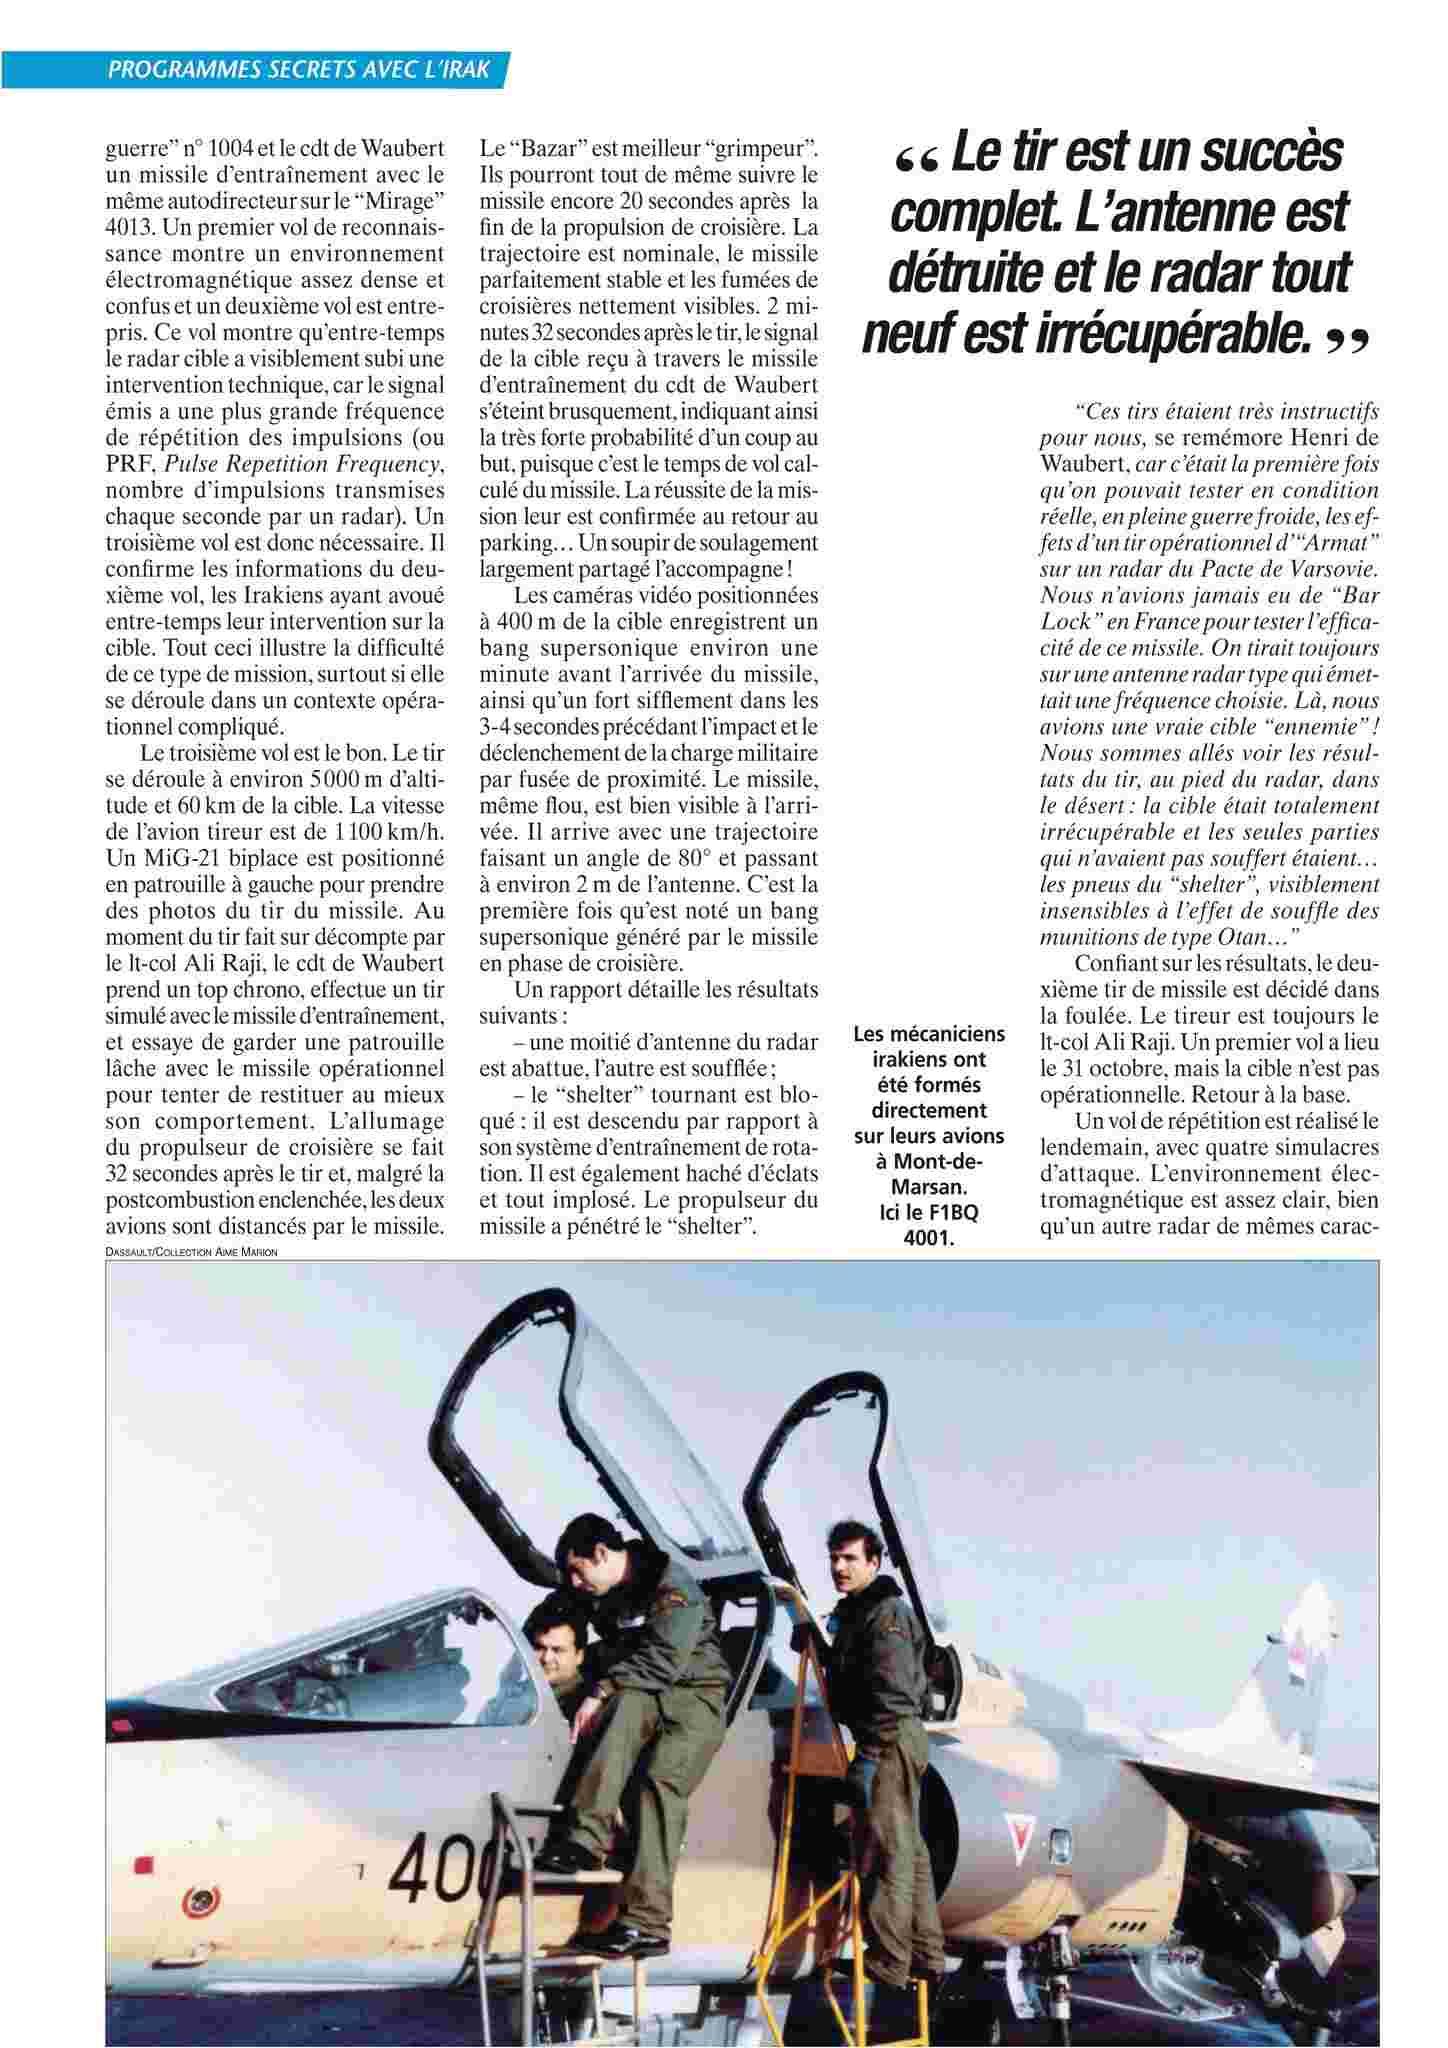 Guerre Iran-Irak - Page 3 A03011